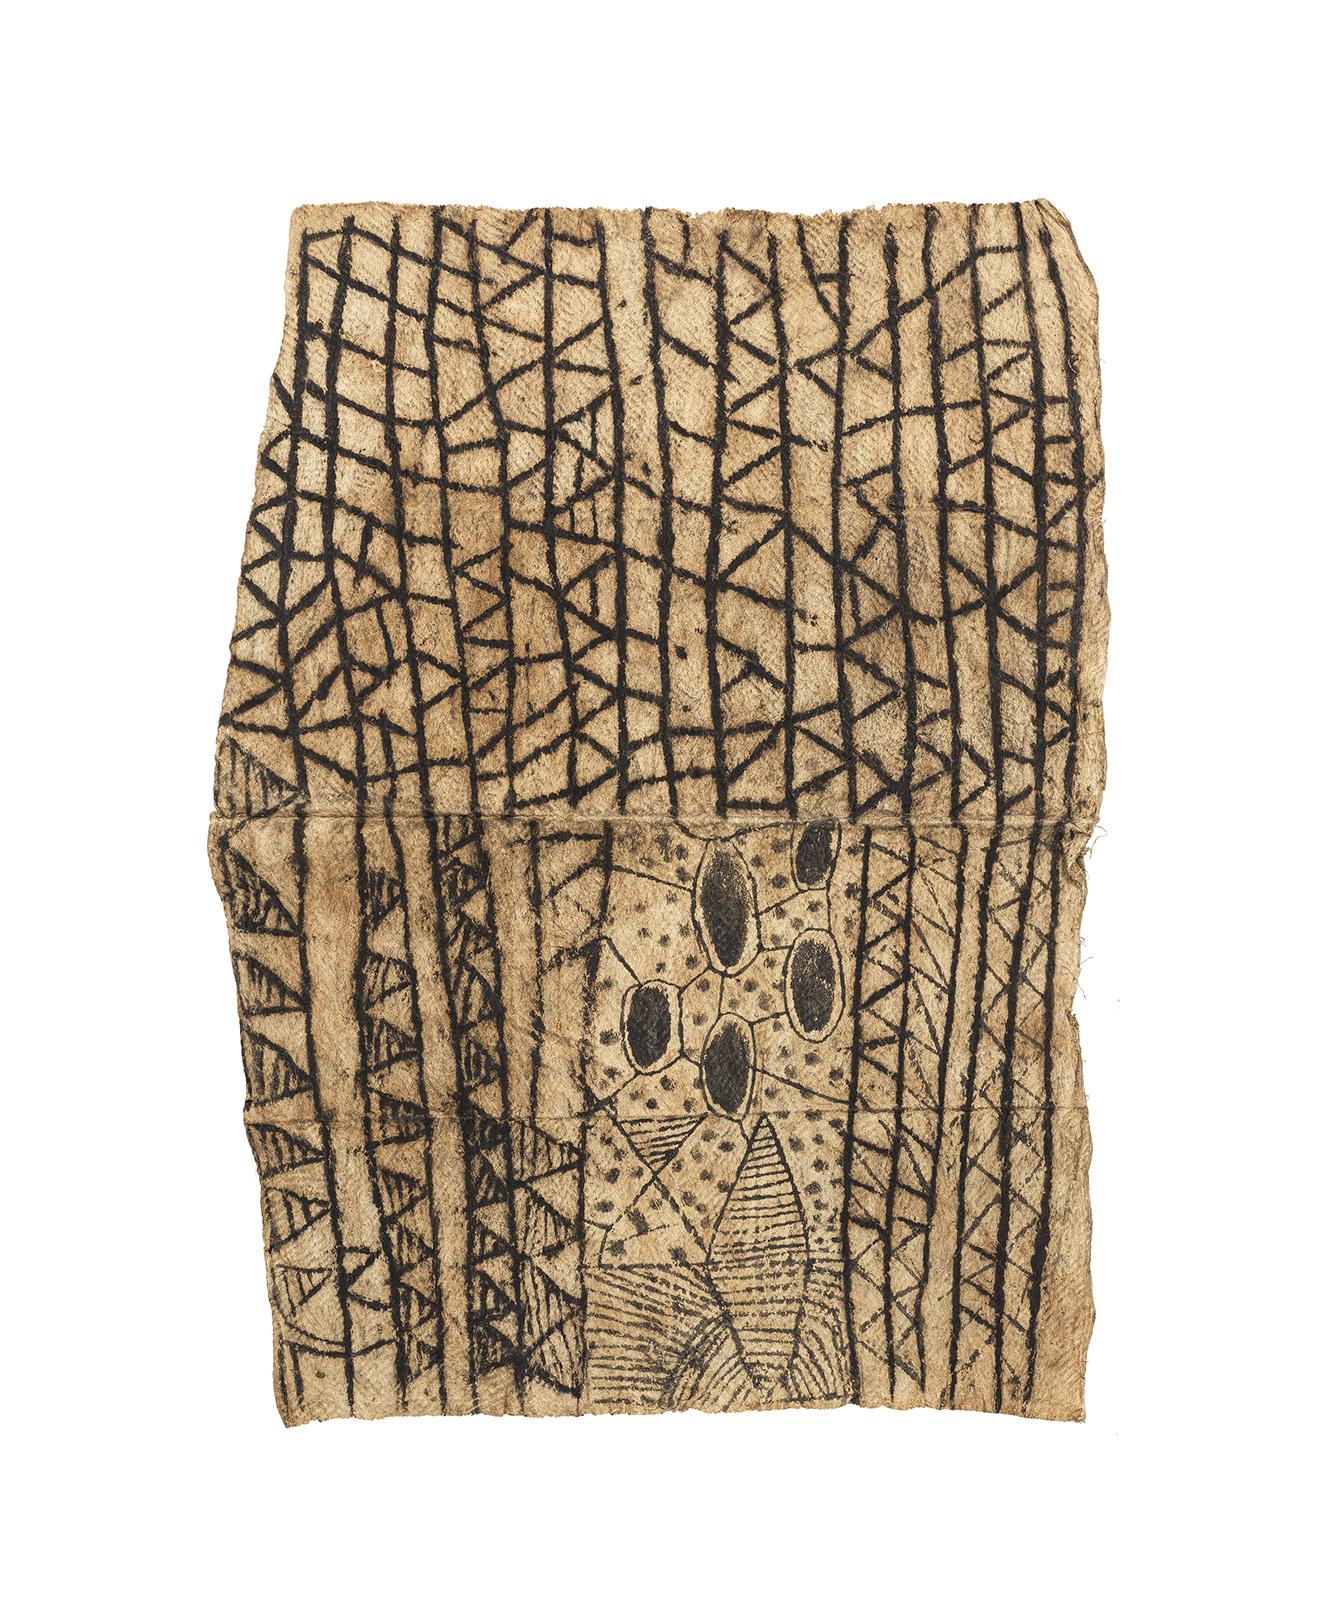 Mbuti Painting on Bark Cloth